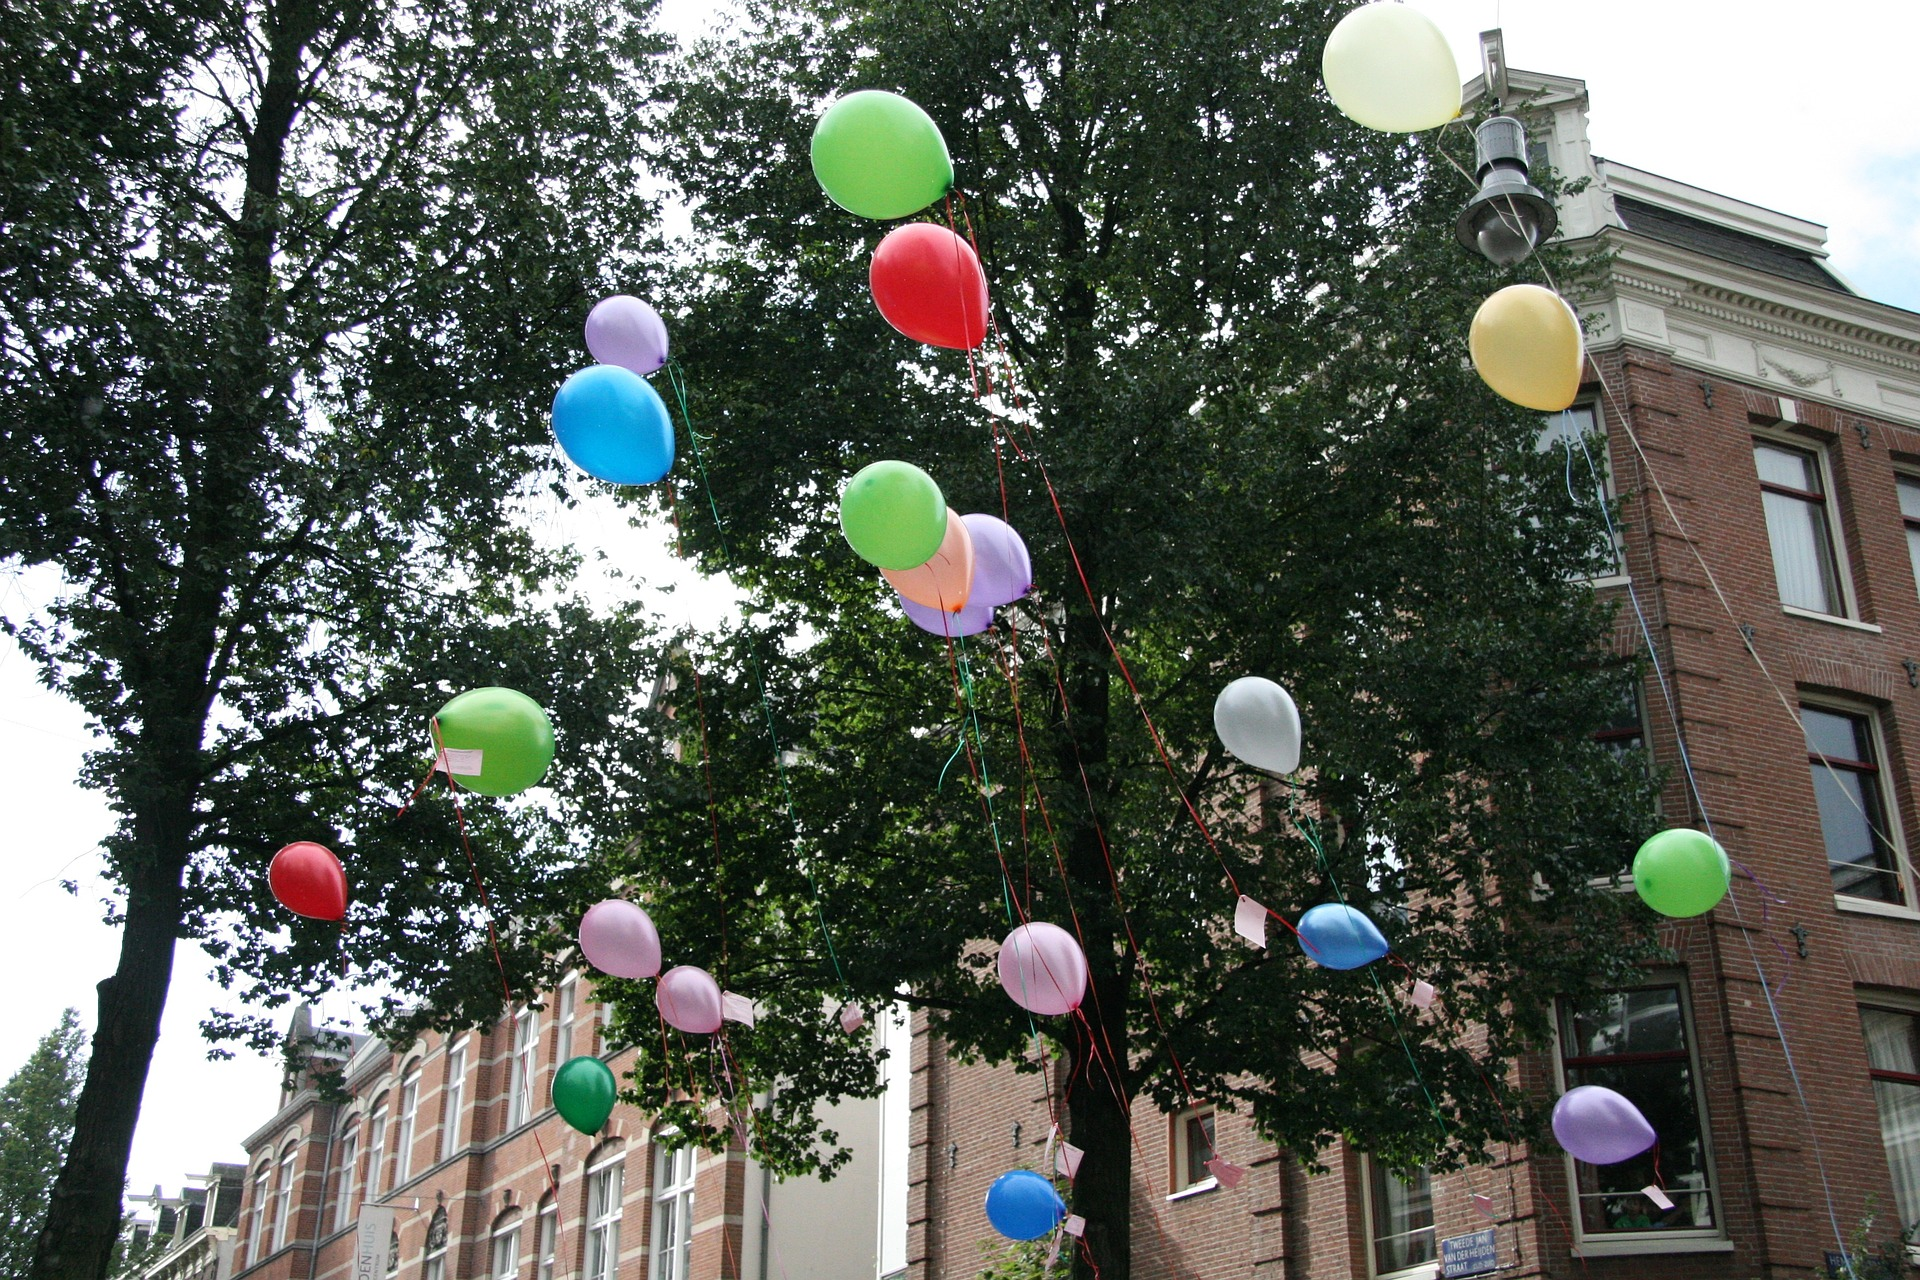 party neighbourhood celebration balloon colour celebrate good happy.jpg